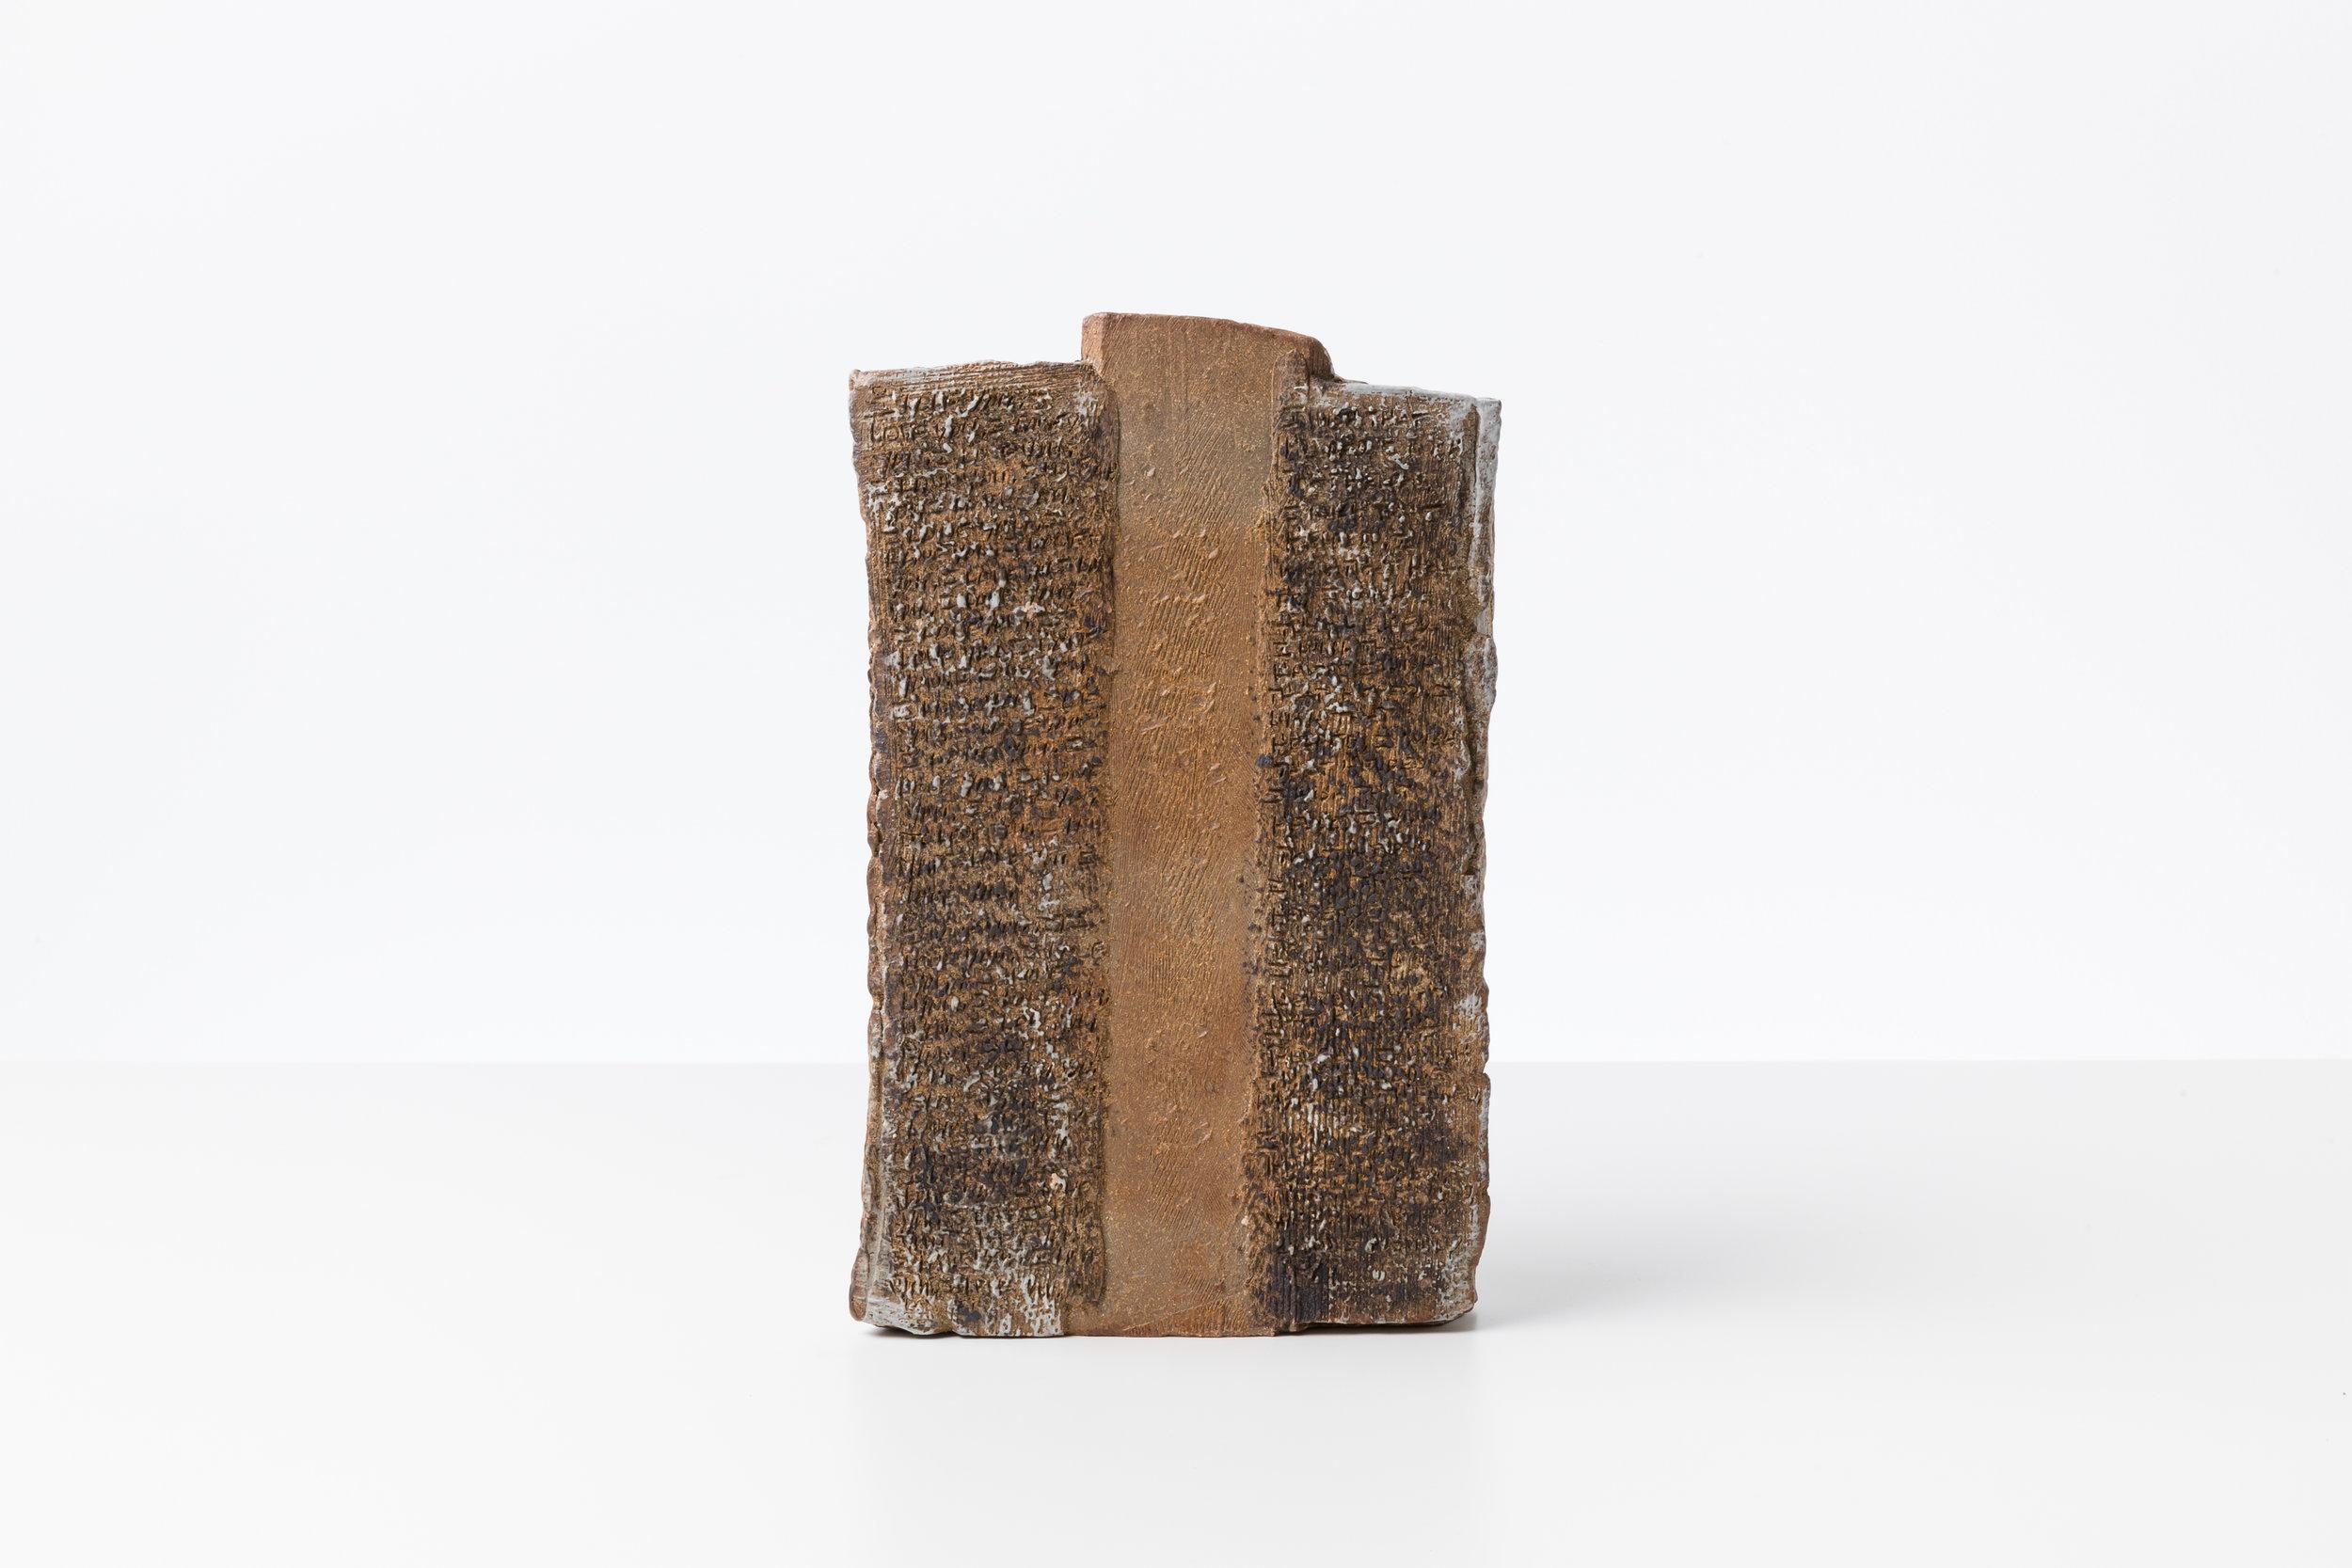 Toni Ross  Stele #5 , 2016 stoneware and black slip 11 3/4 x 7 1/4 x 4 1/4 in.